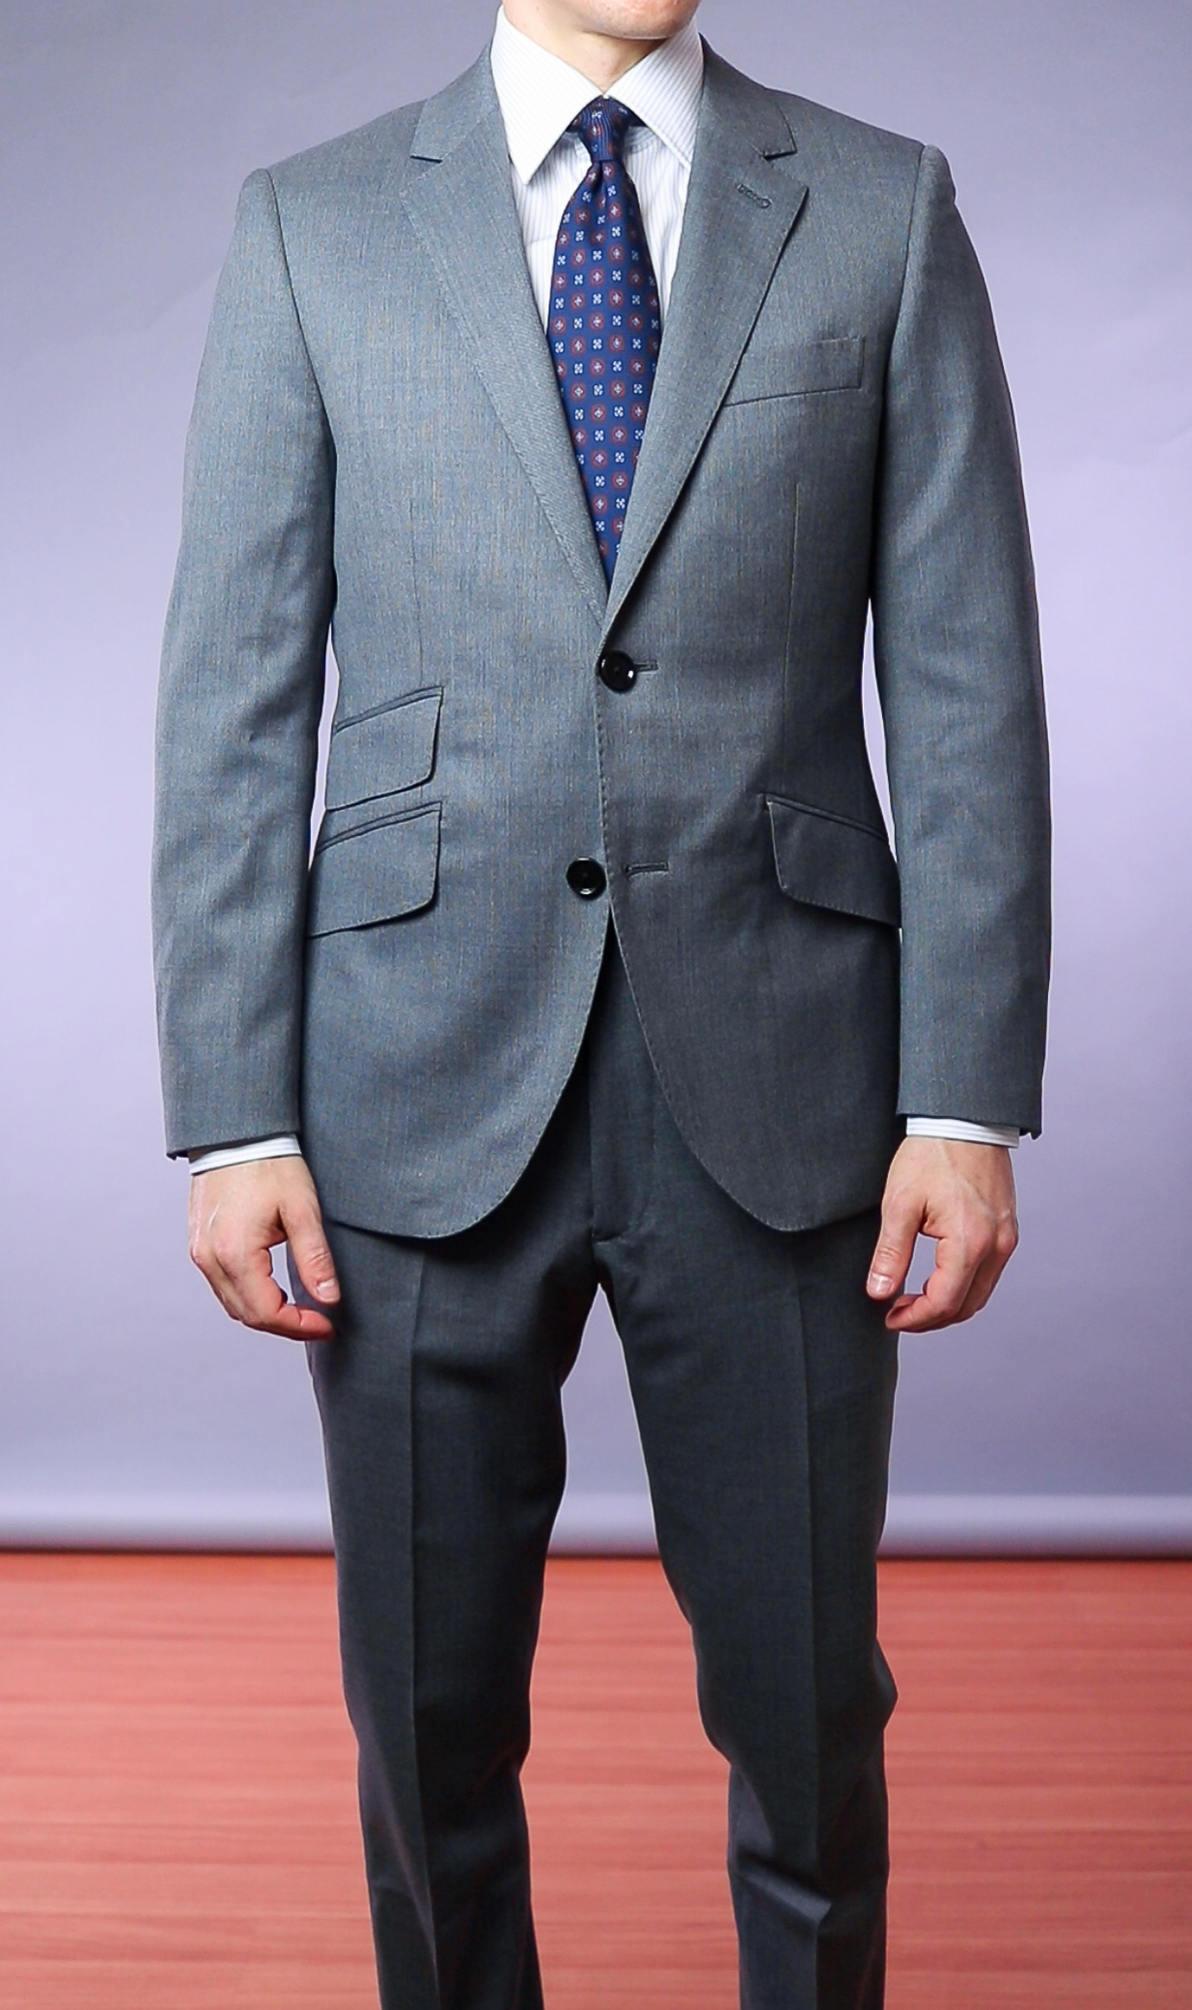 Indochino custom suit fit